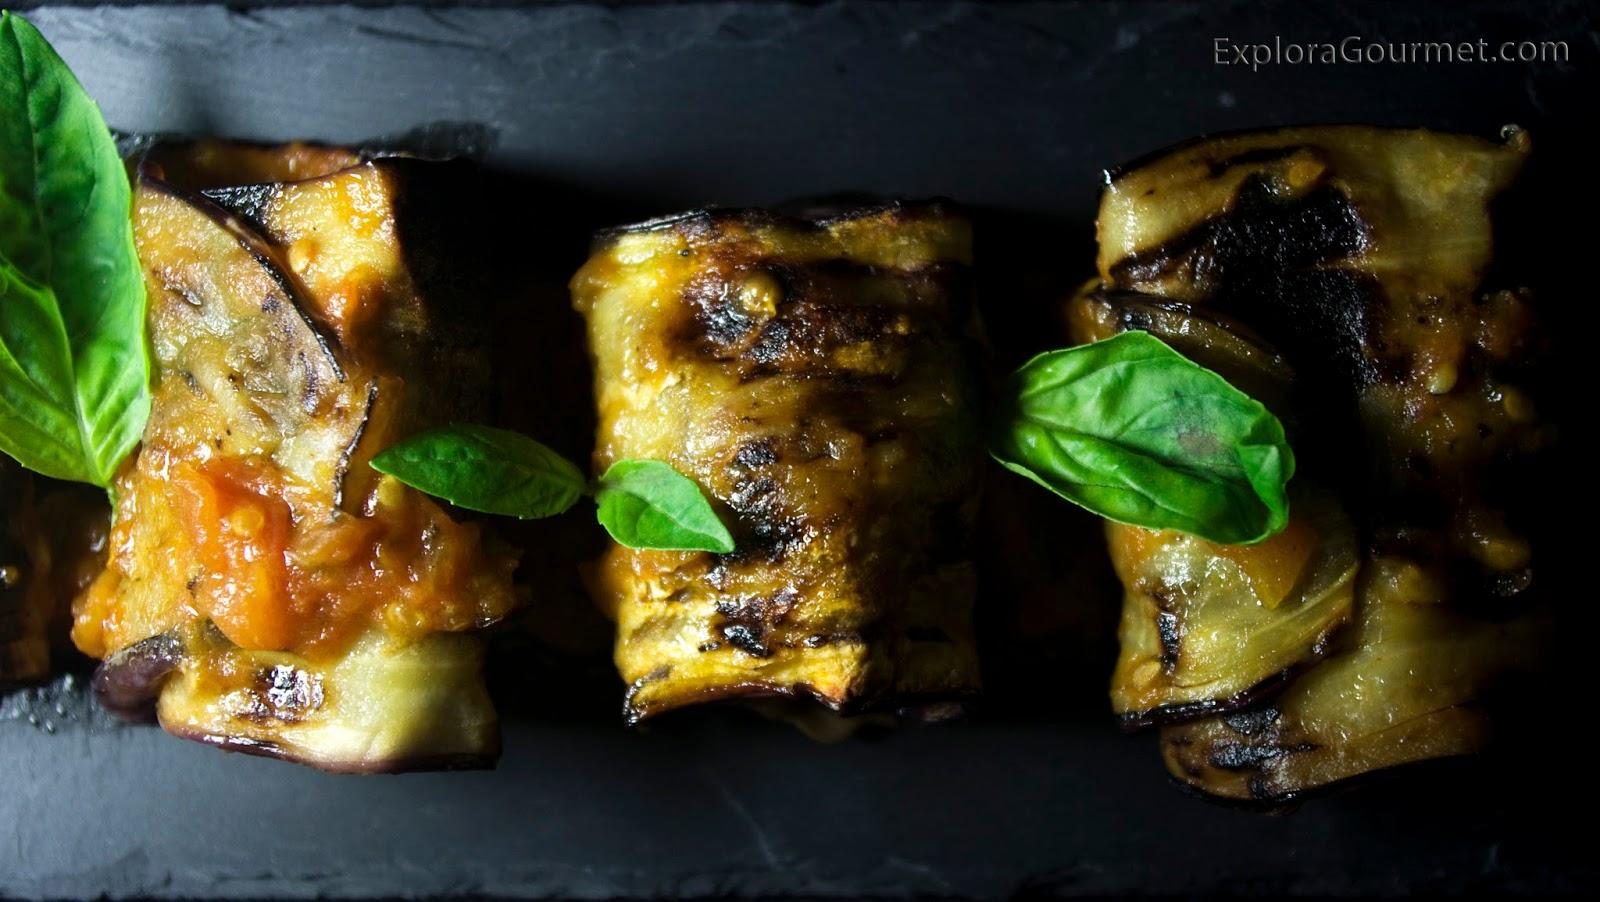 Rollitos de berenjena rellenos de carne